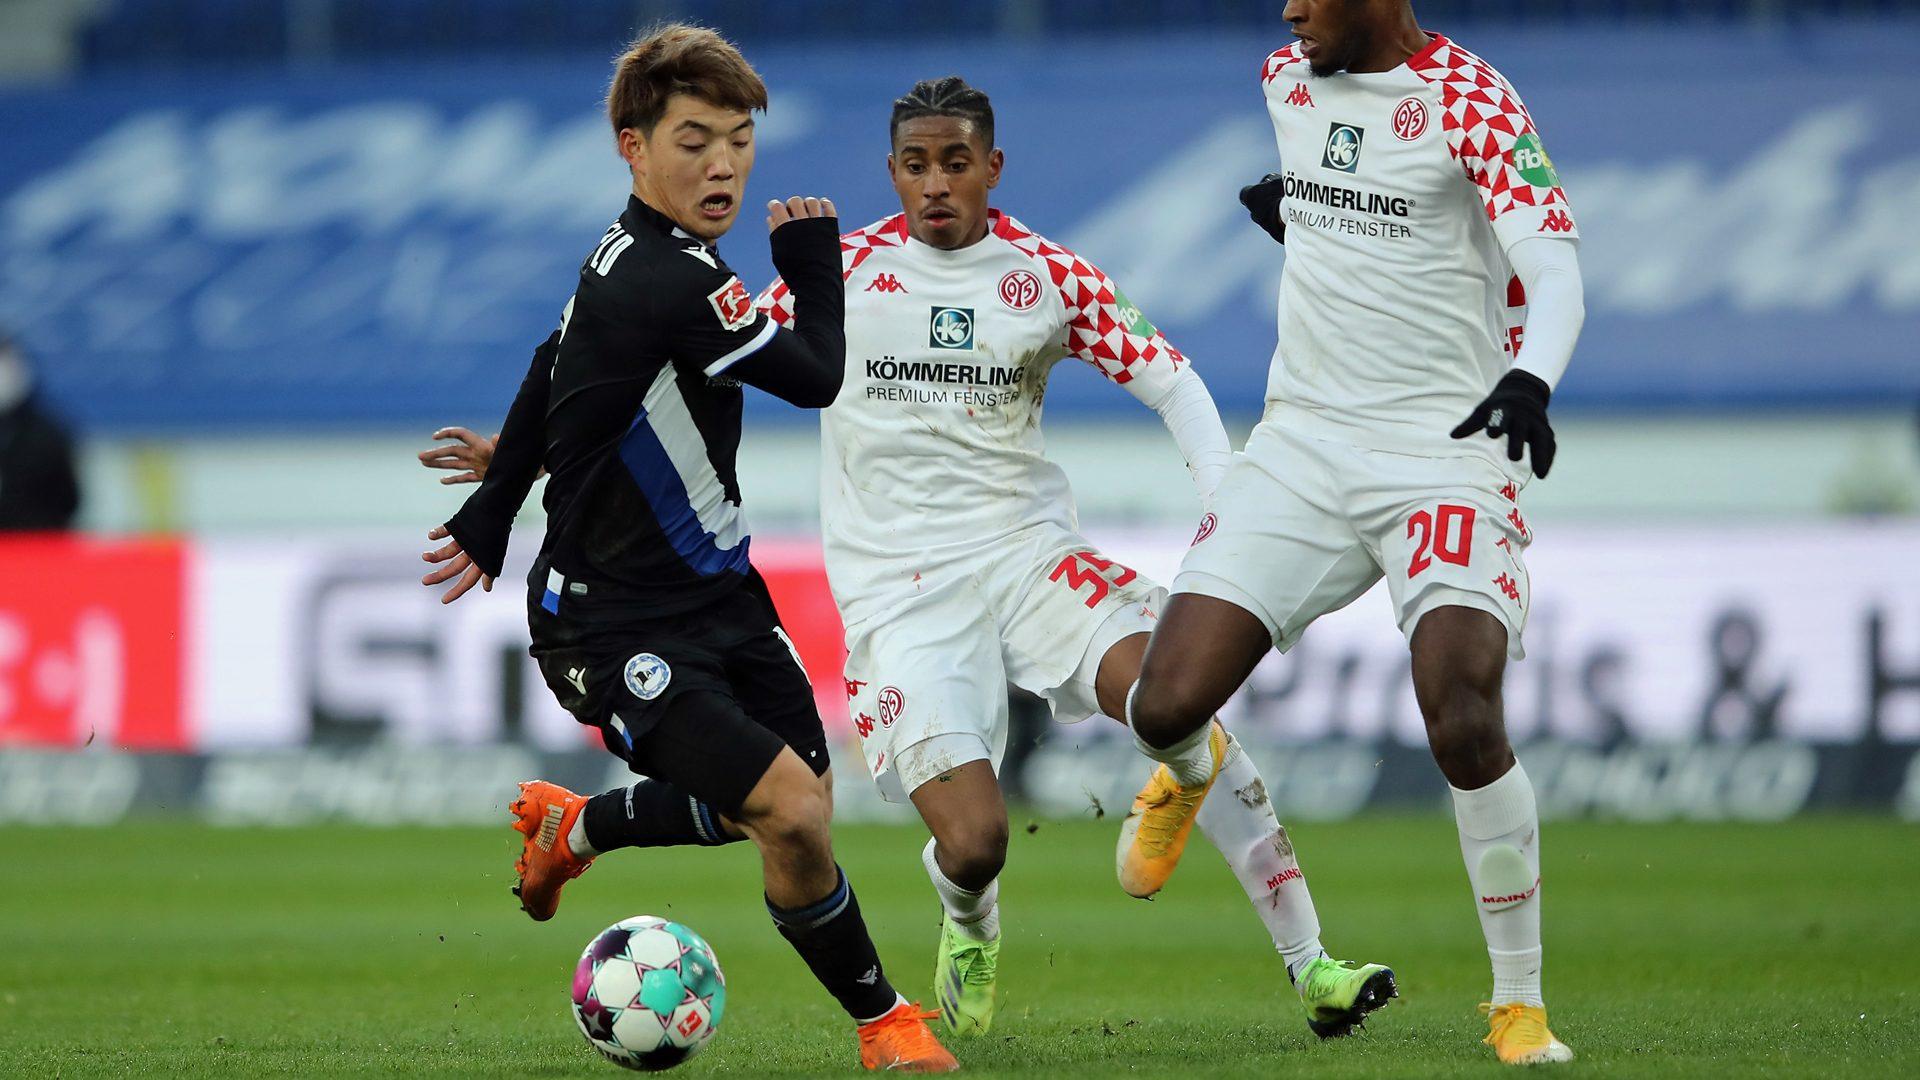 Mainz vs Arminia Bielefeld: Prediction, Lineups, Team News, Betting Tips & Match Previews